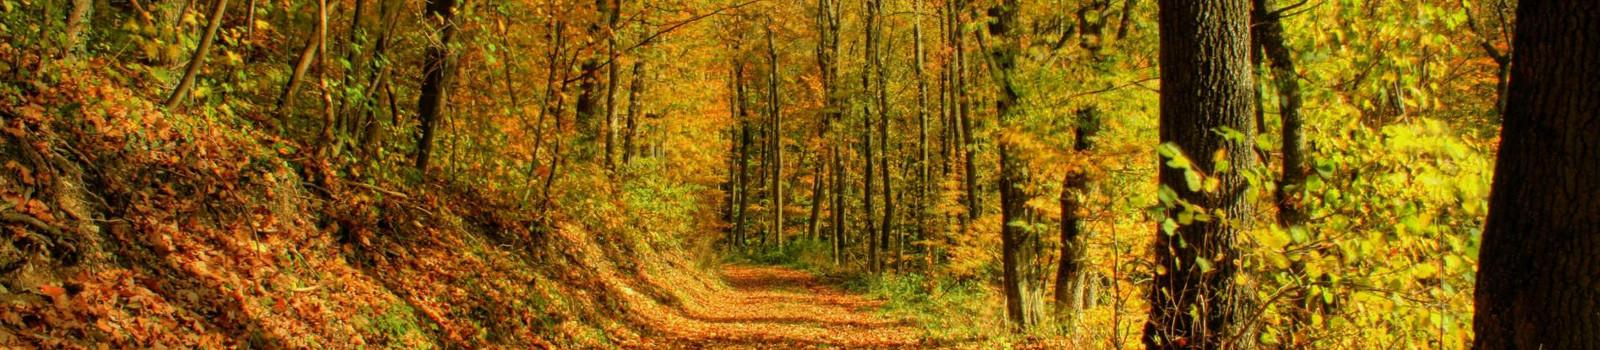 autumn_forest